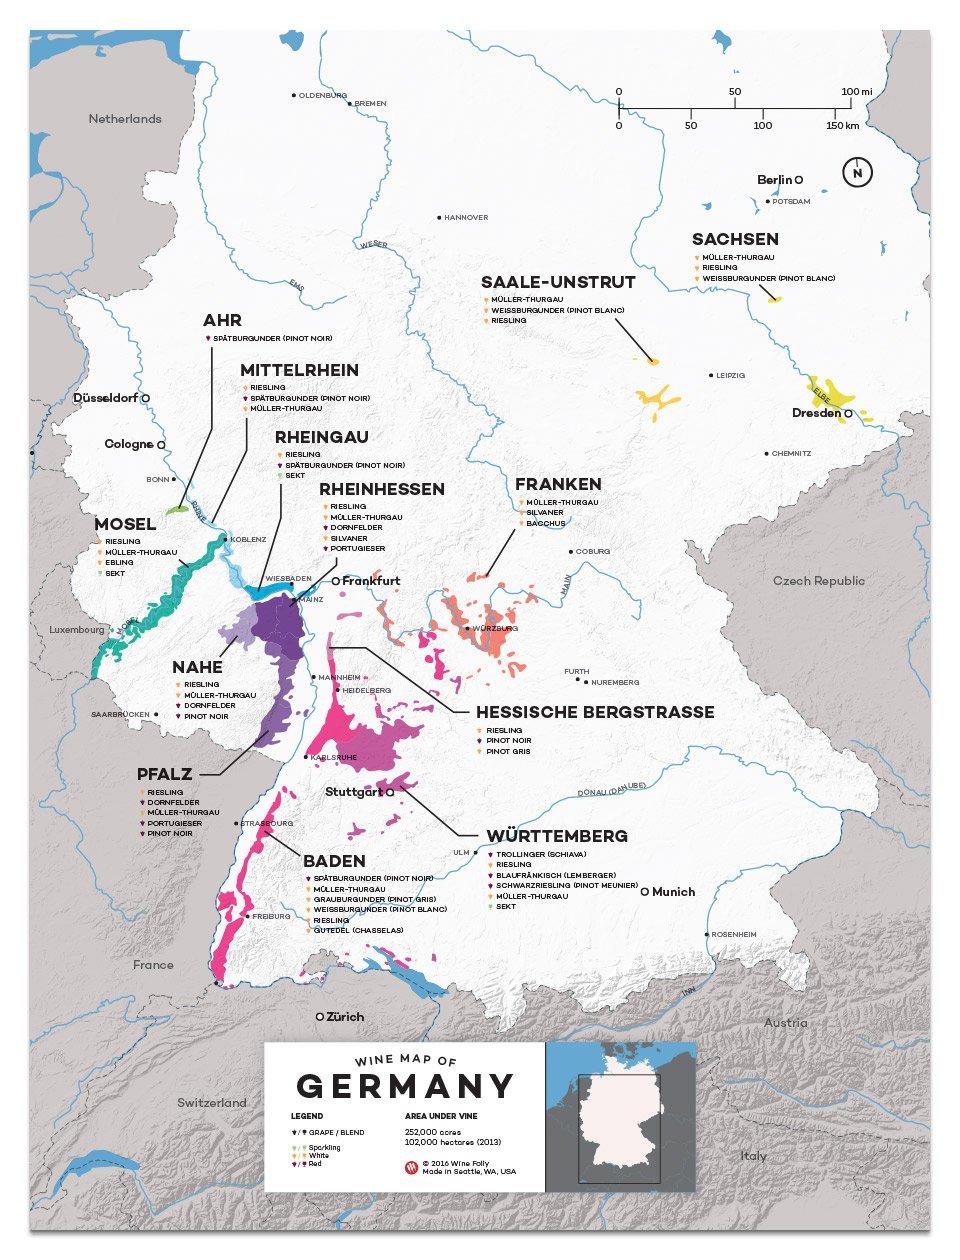 An Overview of German Wine Regions